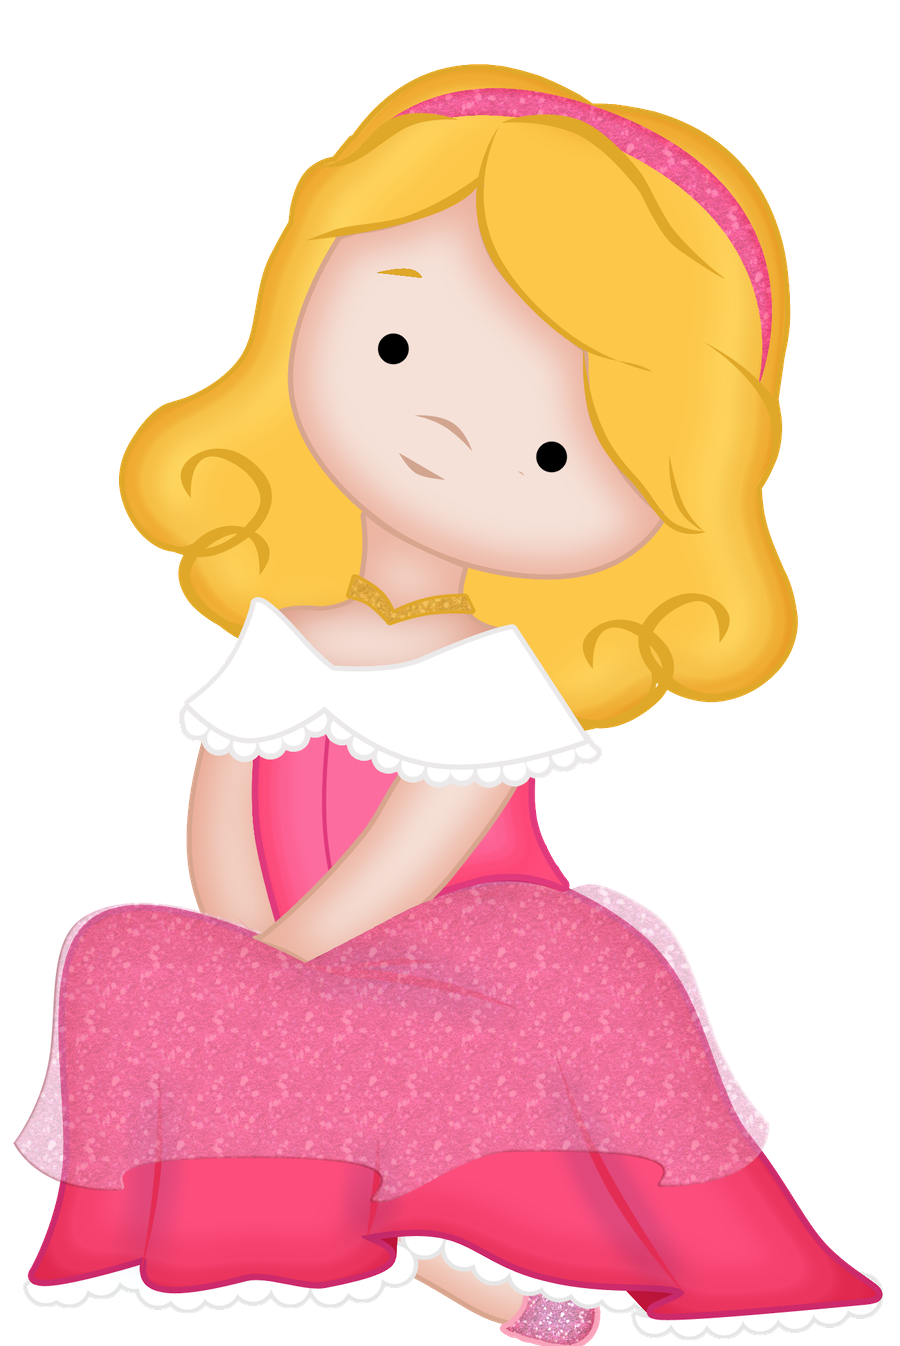 clipart princesas disney - photo #13